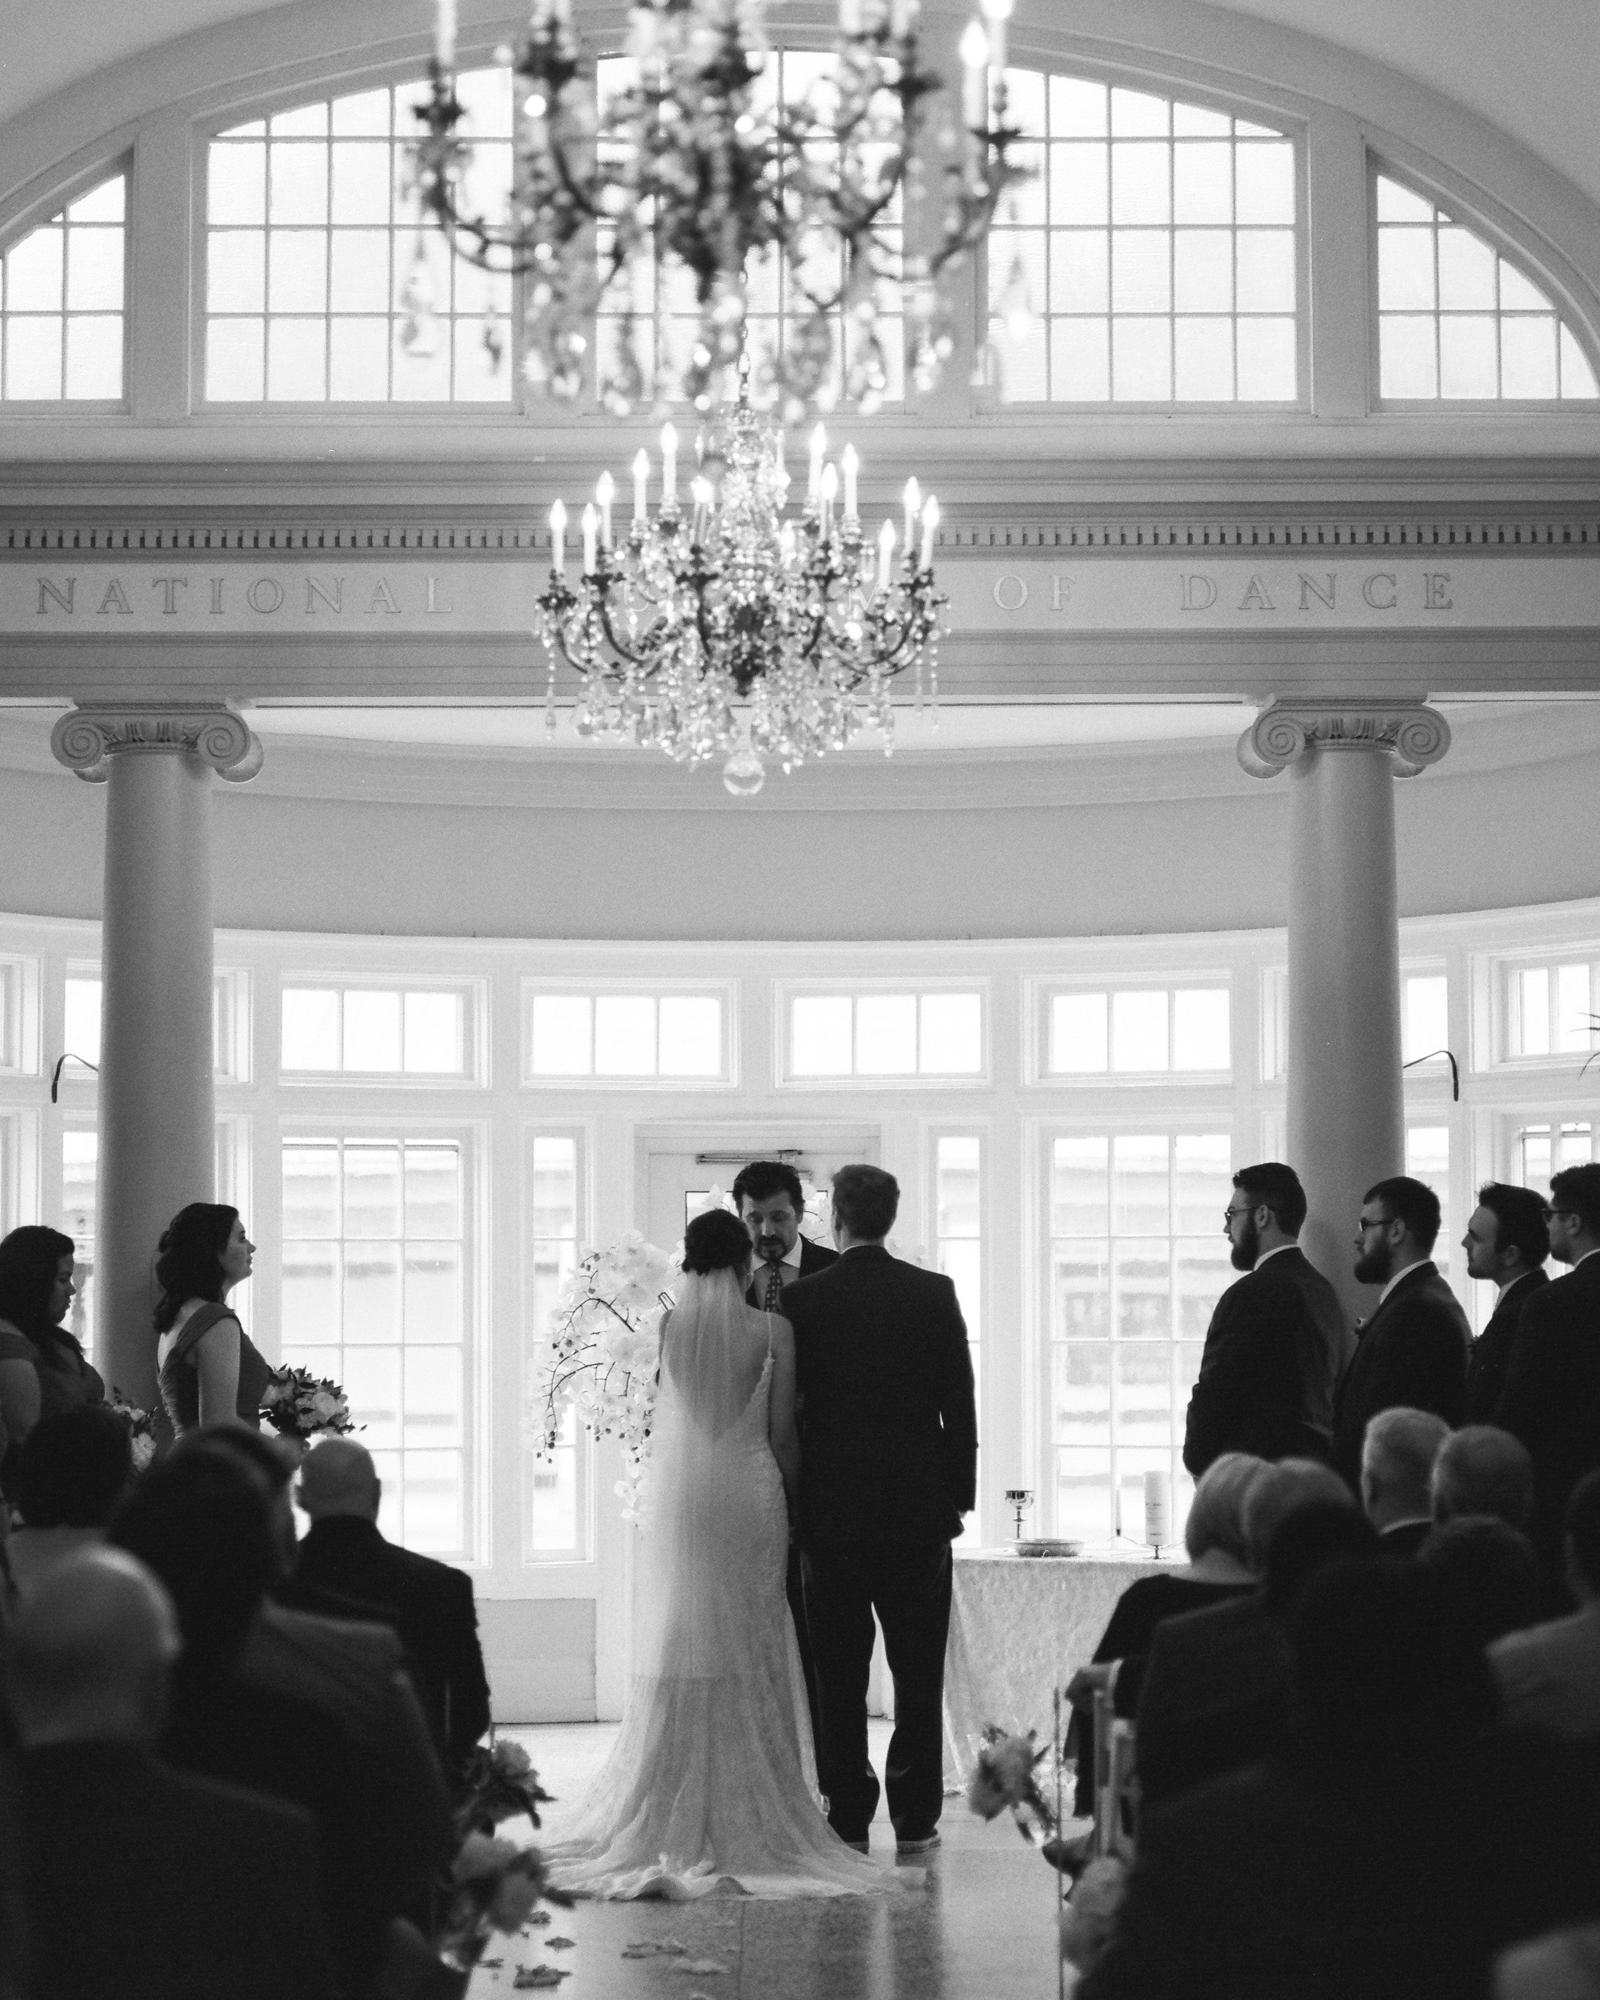 saratoga-springs-new-york-national-museum-of-dance-film-wedding-photographer-37.jpg